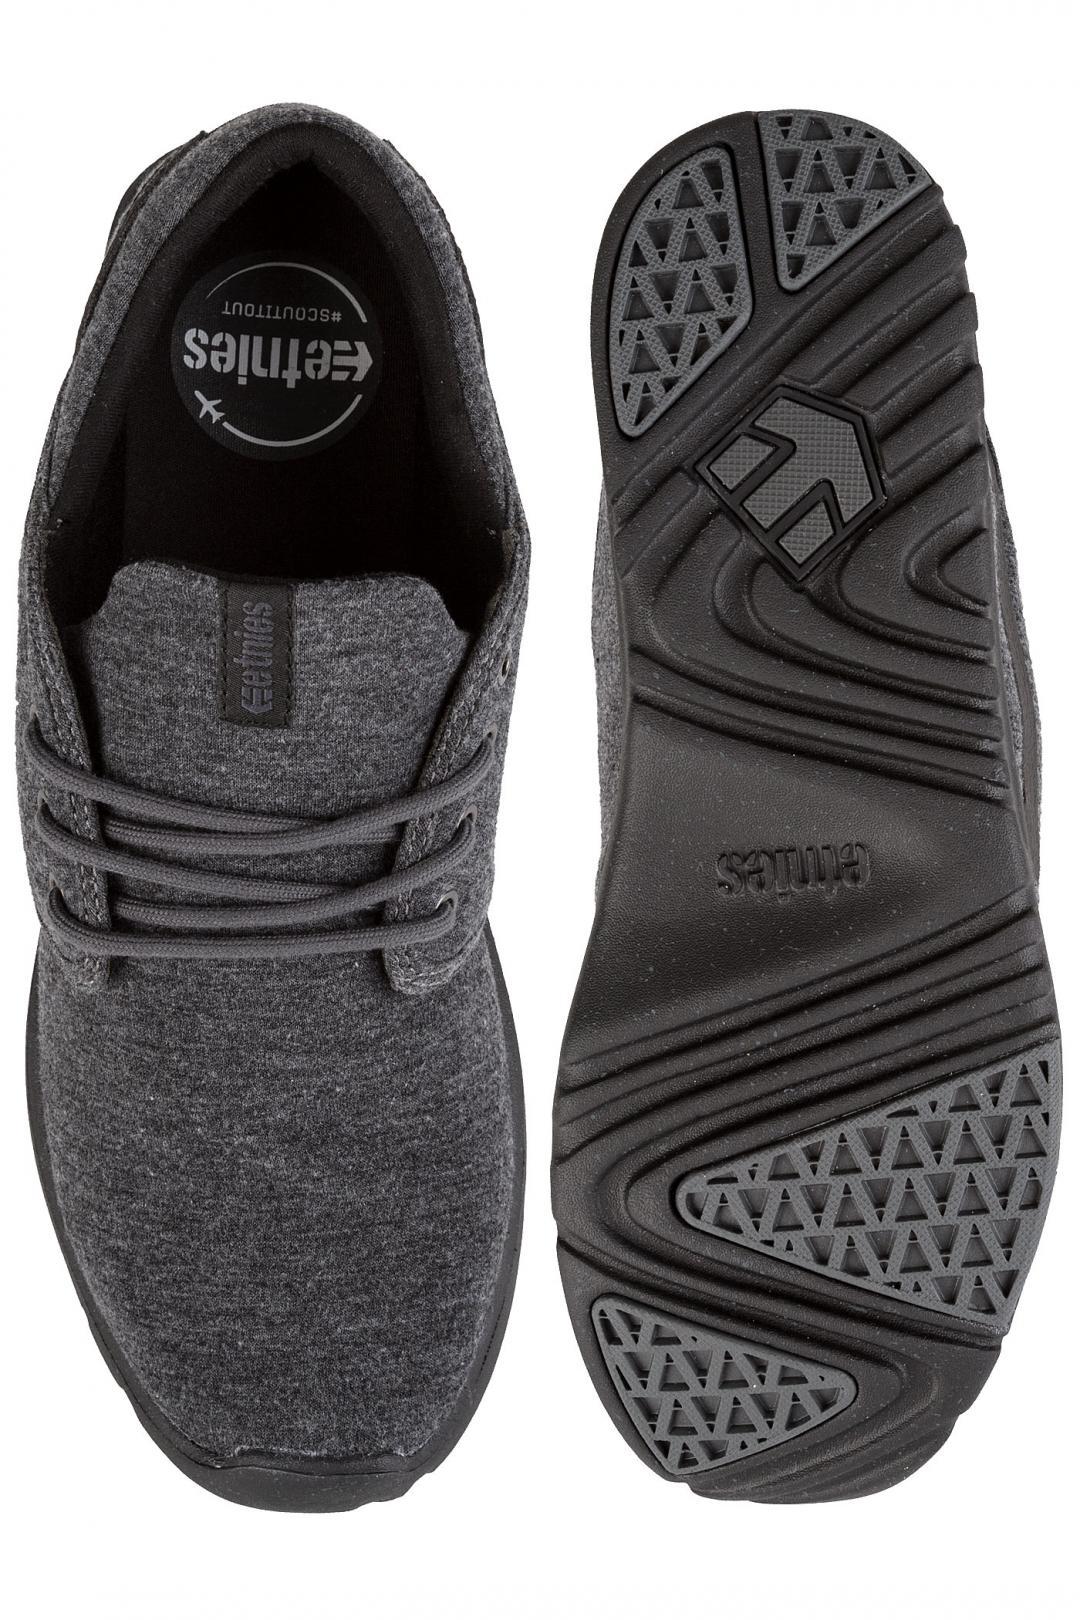 Uomo Etnies Scout black grey silver | Sneaker